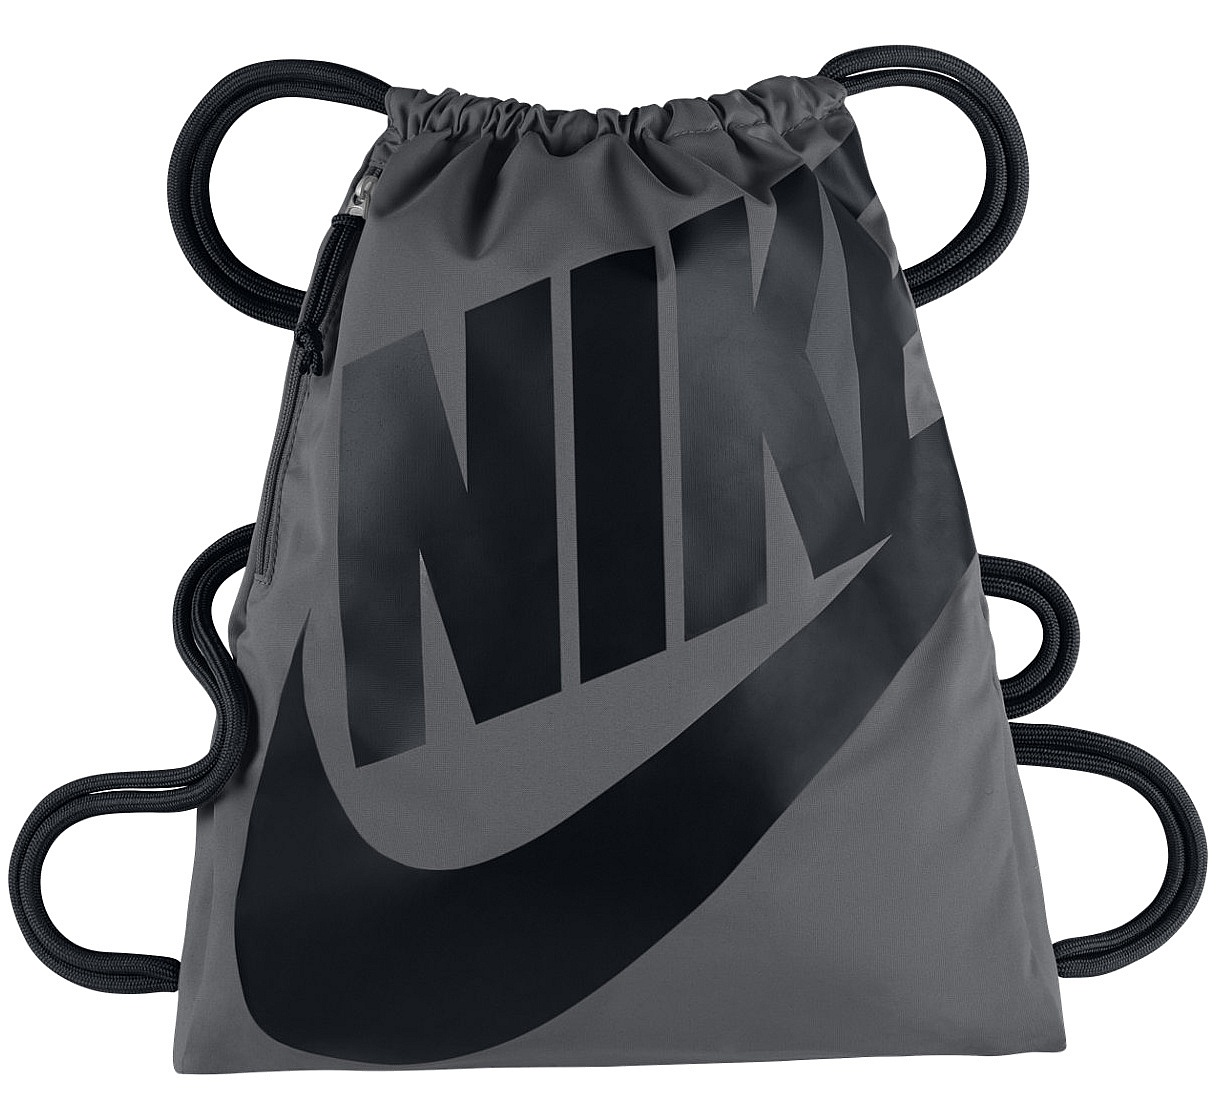 vak Nike Heritage Gymsack - 009 Dark Gray Black Black 13 L 321e1826ac